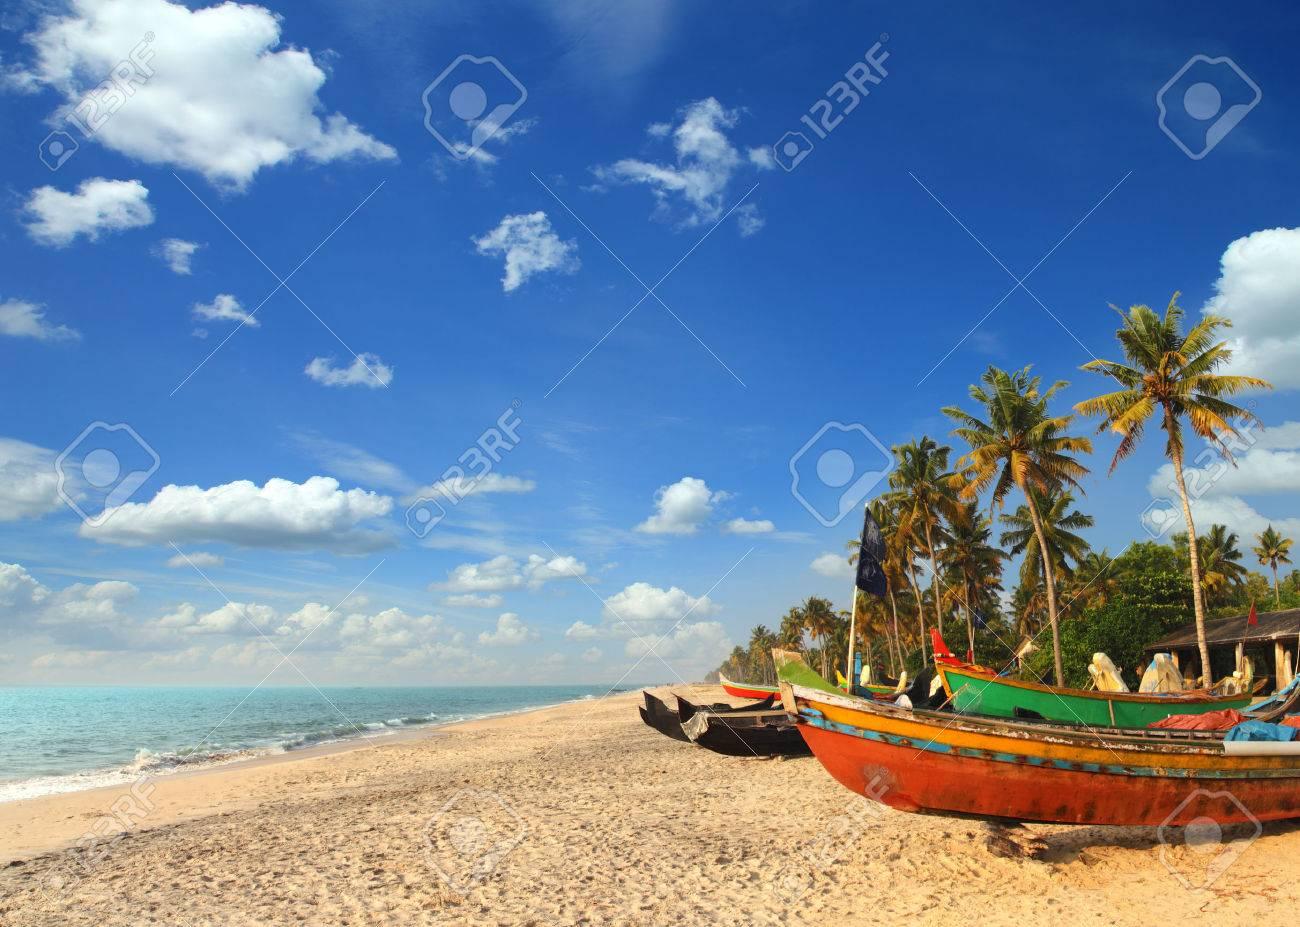 old fishing boats on beach - kerala india - 31320362